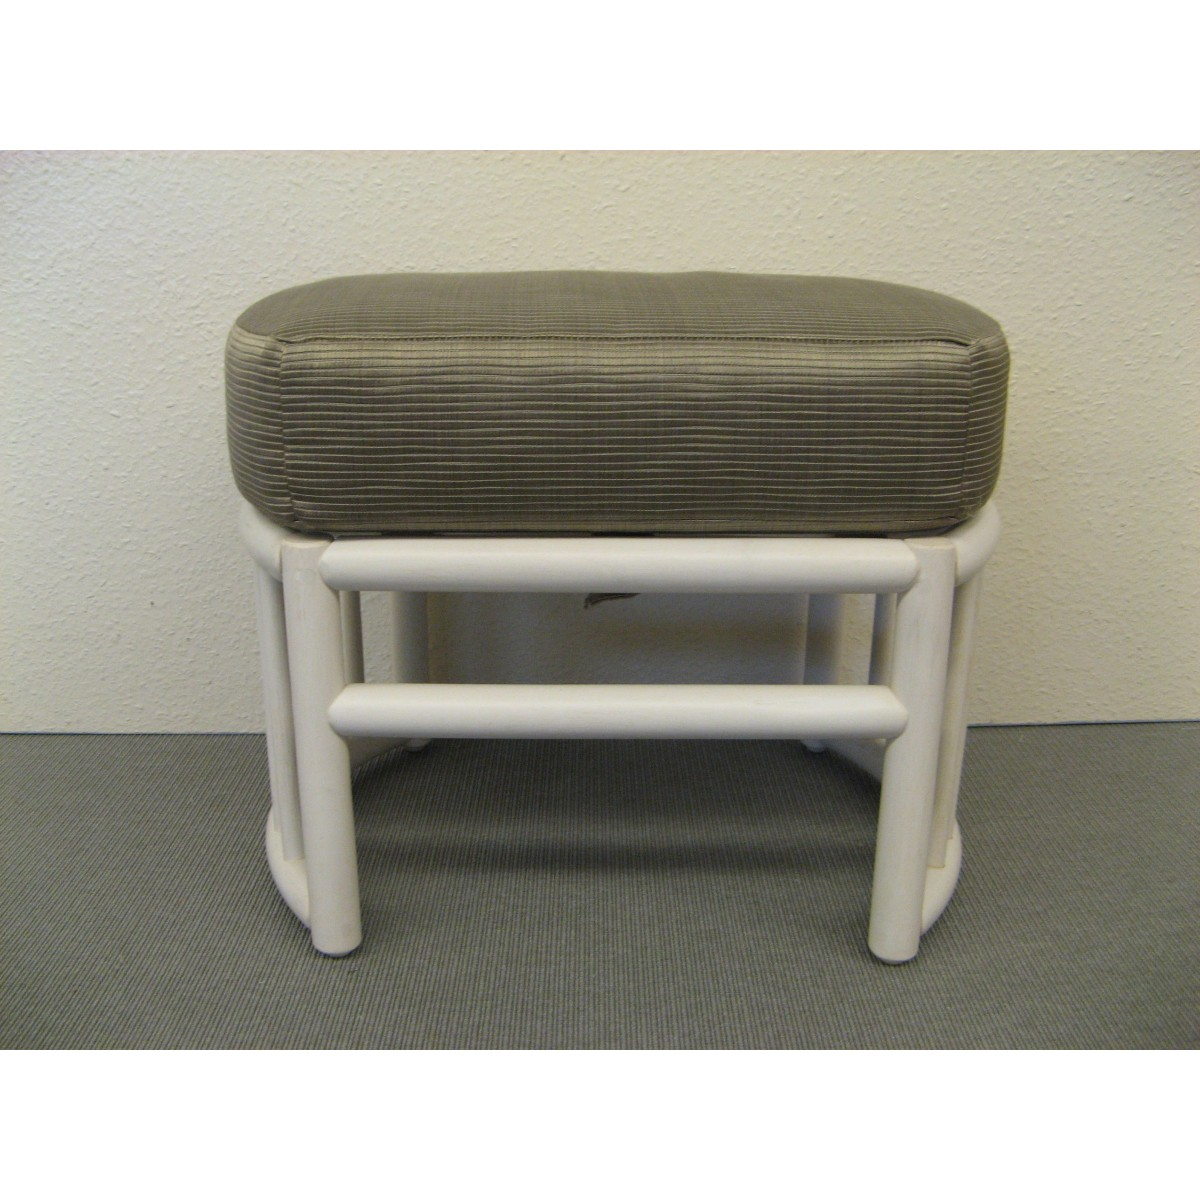 pouf en rotin avec coussin. Black Bedroom Furniture Sets. Home Design Ideas